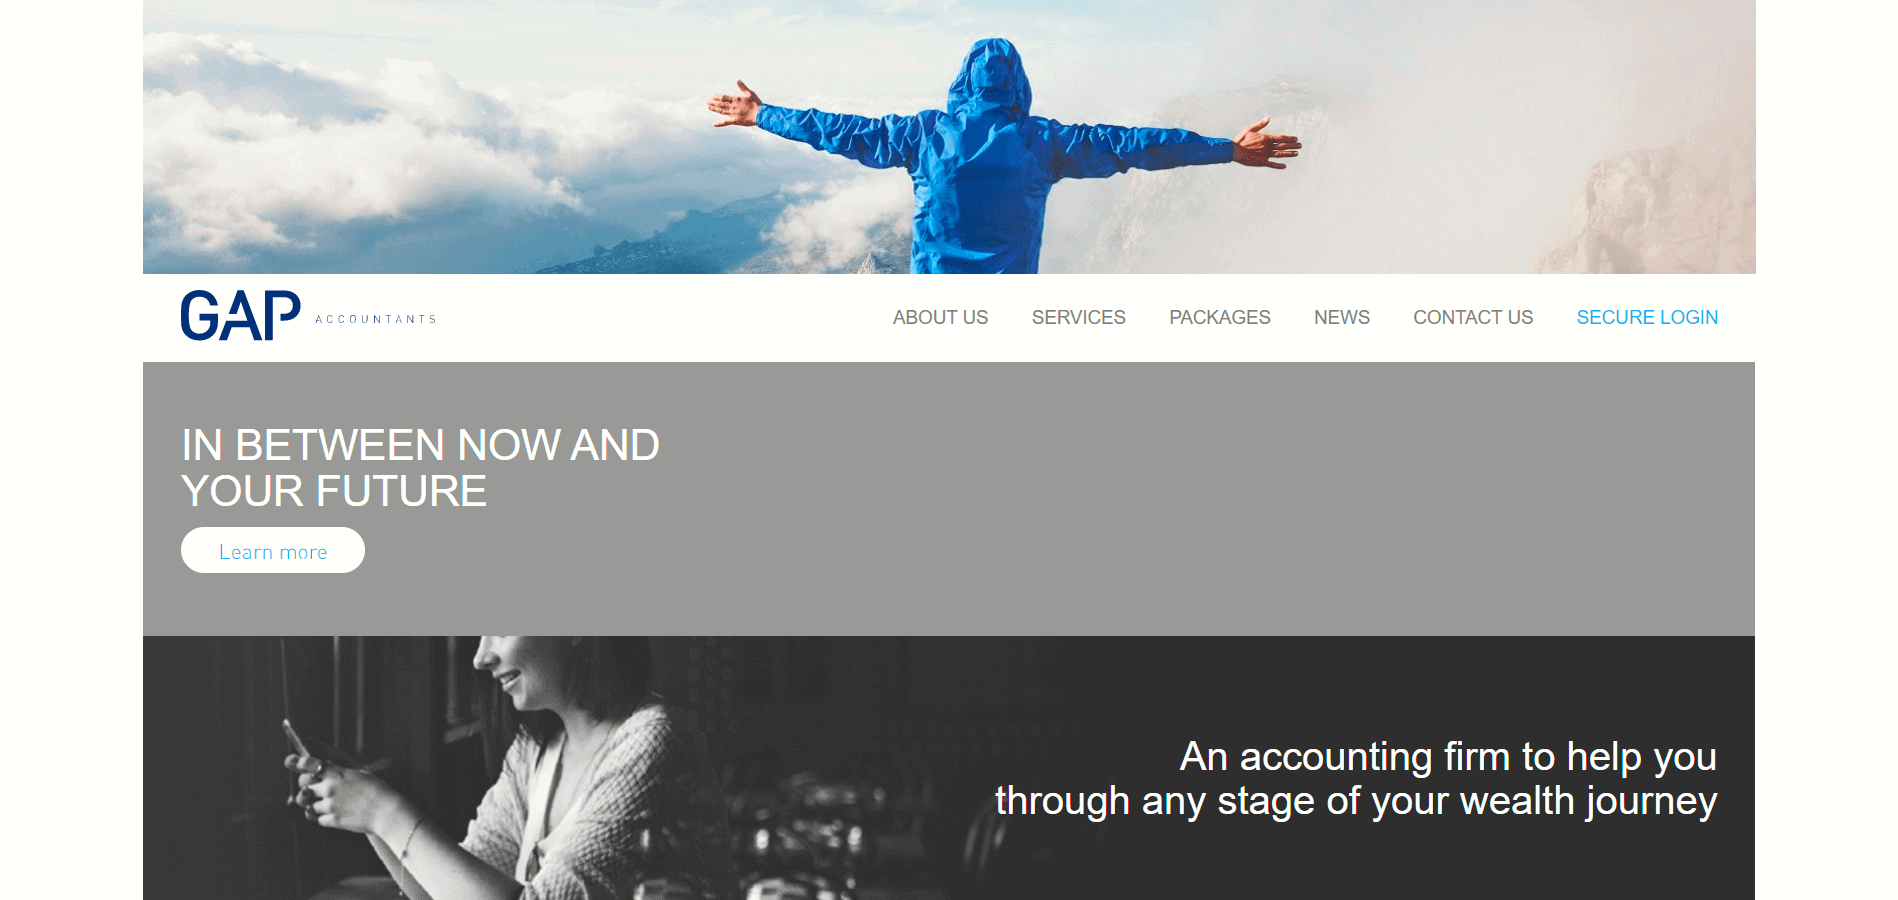 Gap Accountants